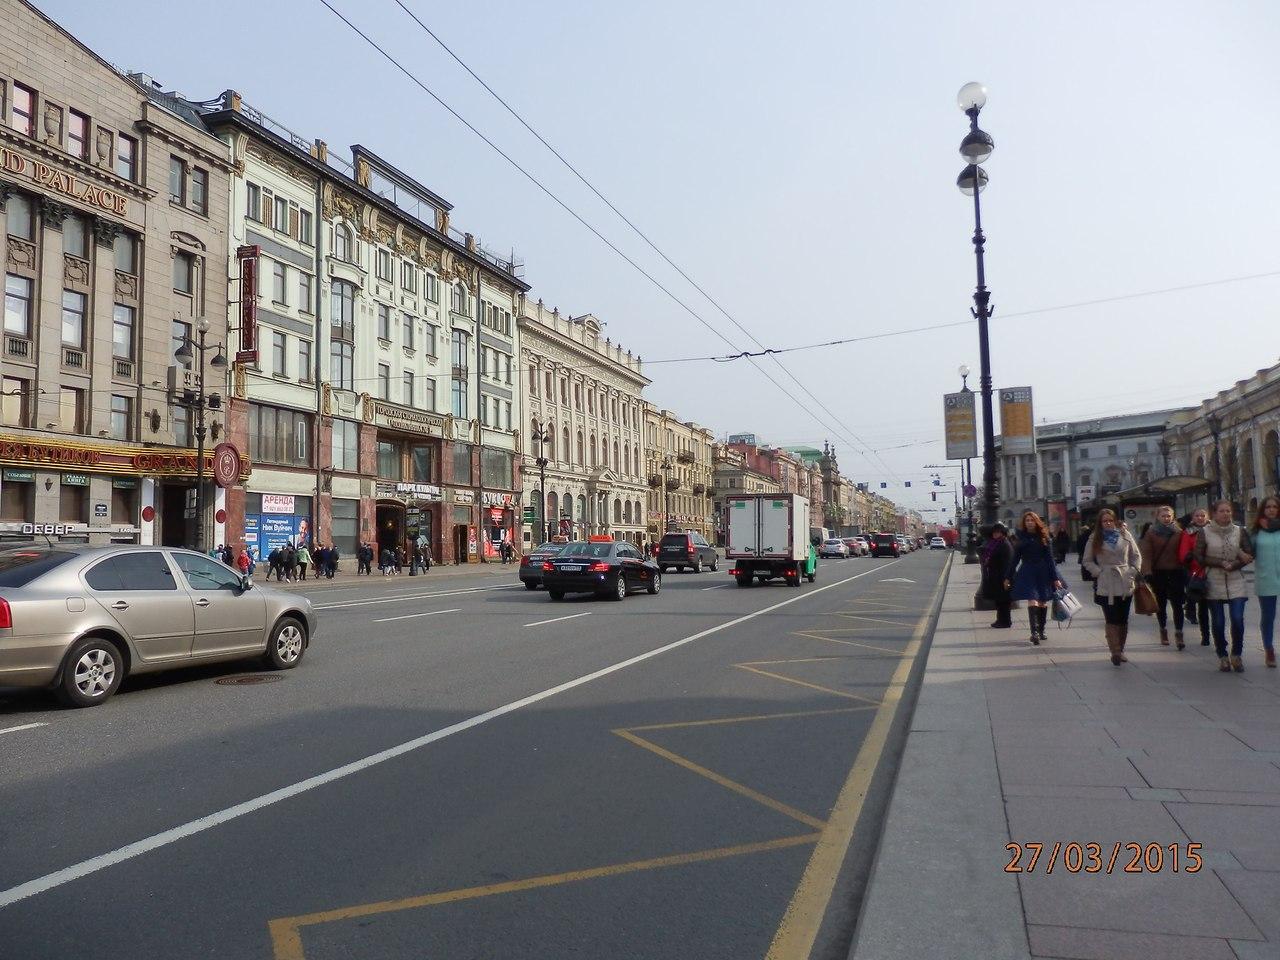 Прогулка по Невскому проспекту XDzbfD2F4Yg